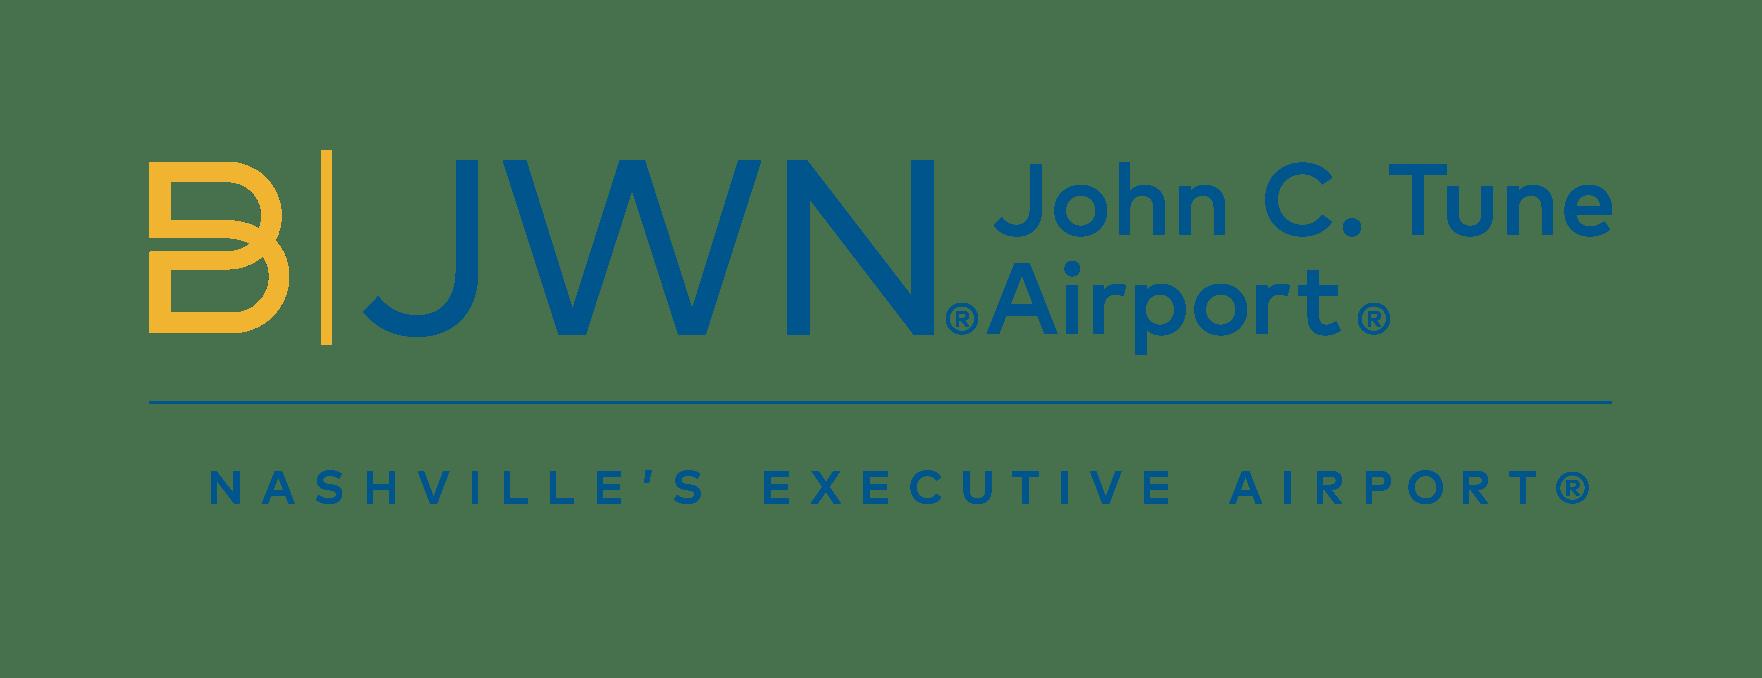 John C Tune Executive Airport